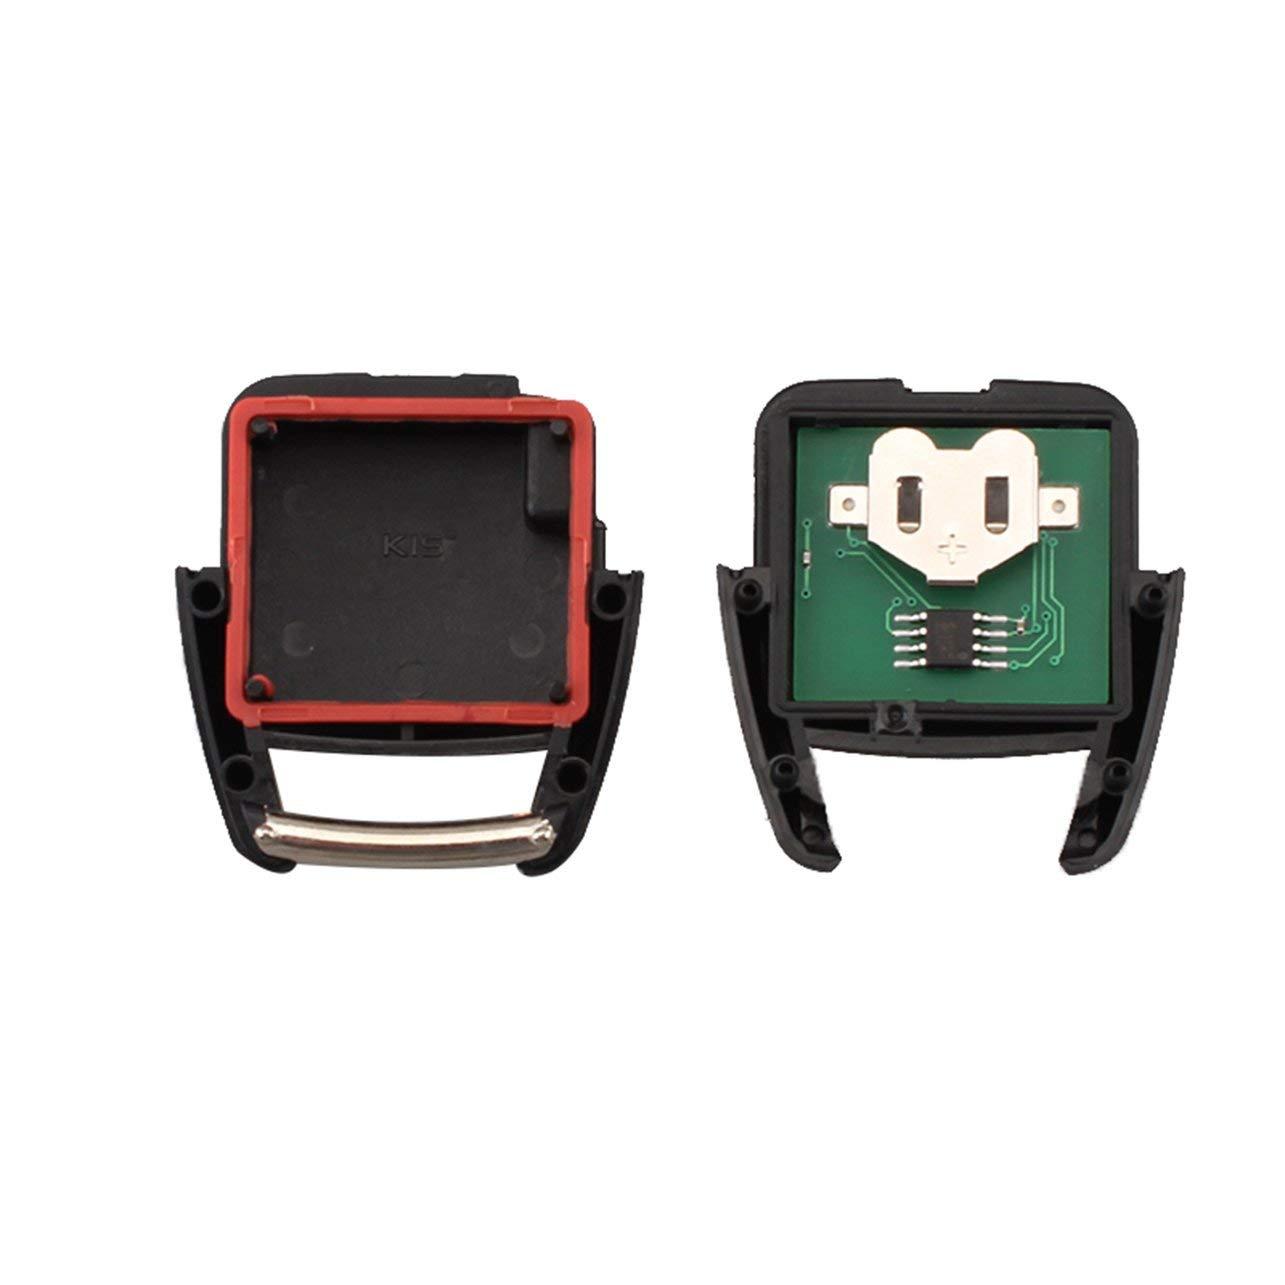 WOSOSYEYO 2 Bot/ón de Control Remoto Clave Fob para Vauxhall Vectra Opel Astra Zafira 433.92 n Chips